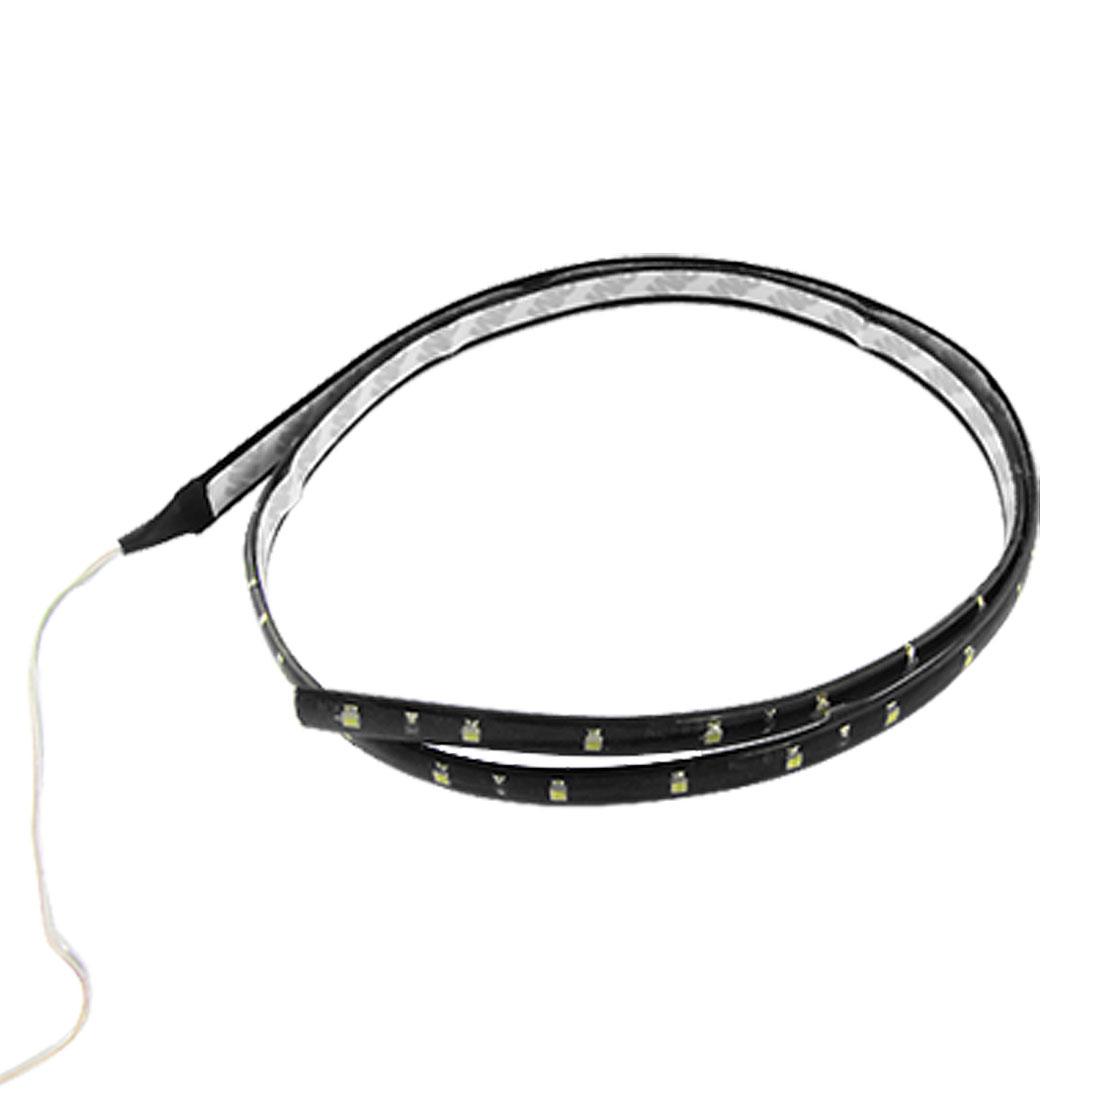 "Auto Car Exterior Flexible White 45 LED Strip Light Lamp 35.4"""